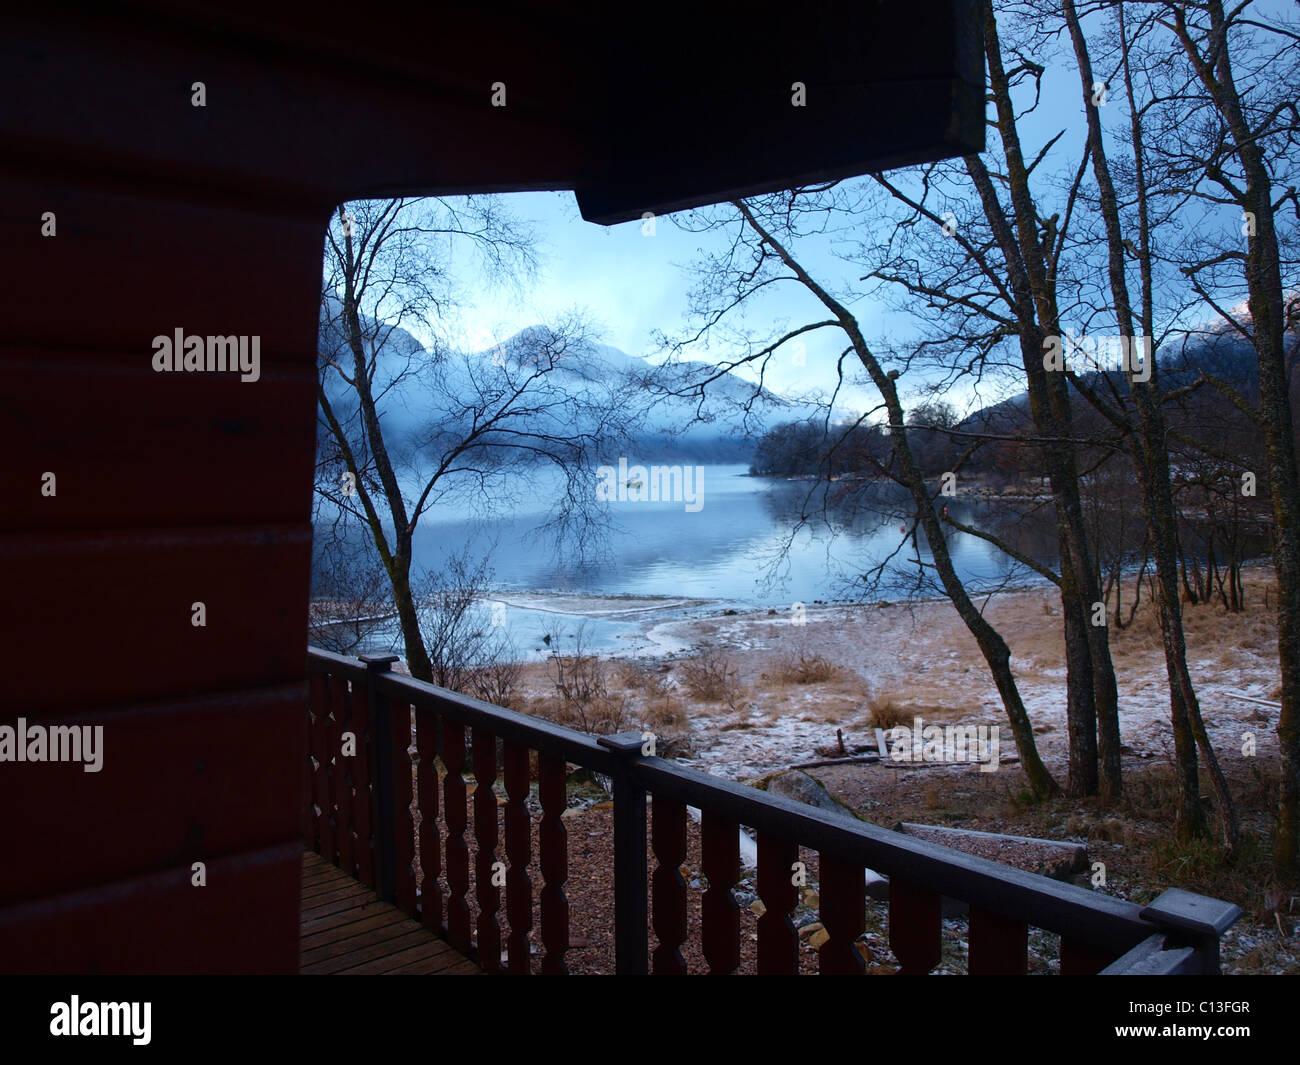 Loch, Shiel, freshwater, Loch, Seile, Scotland, Highland - Stock Image